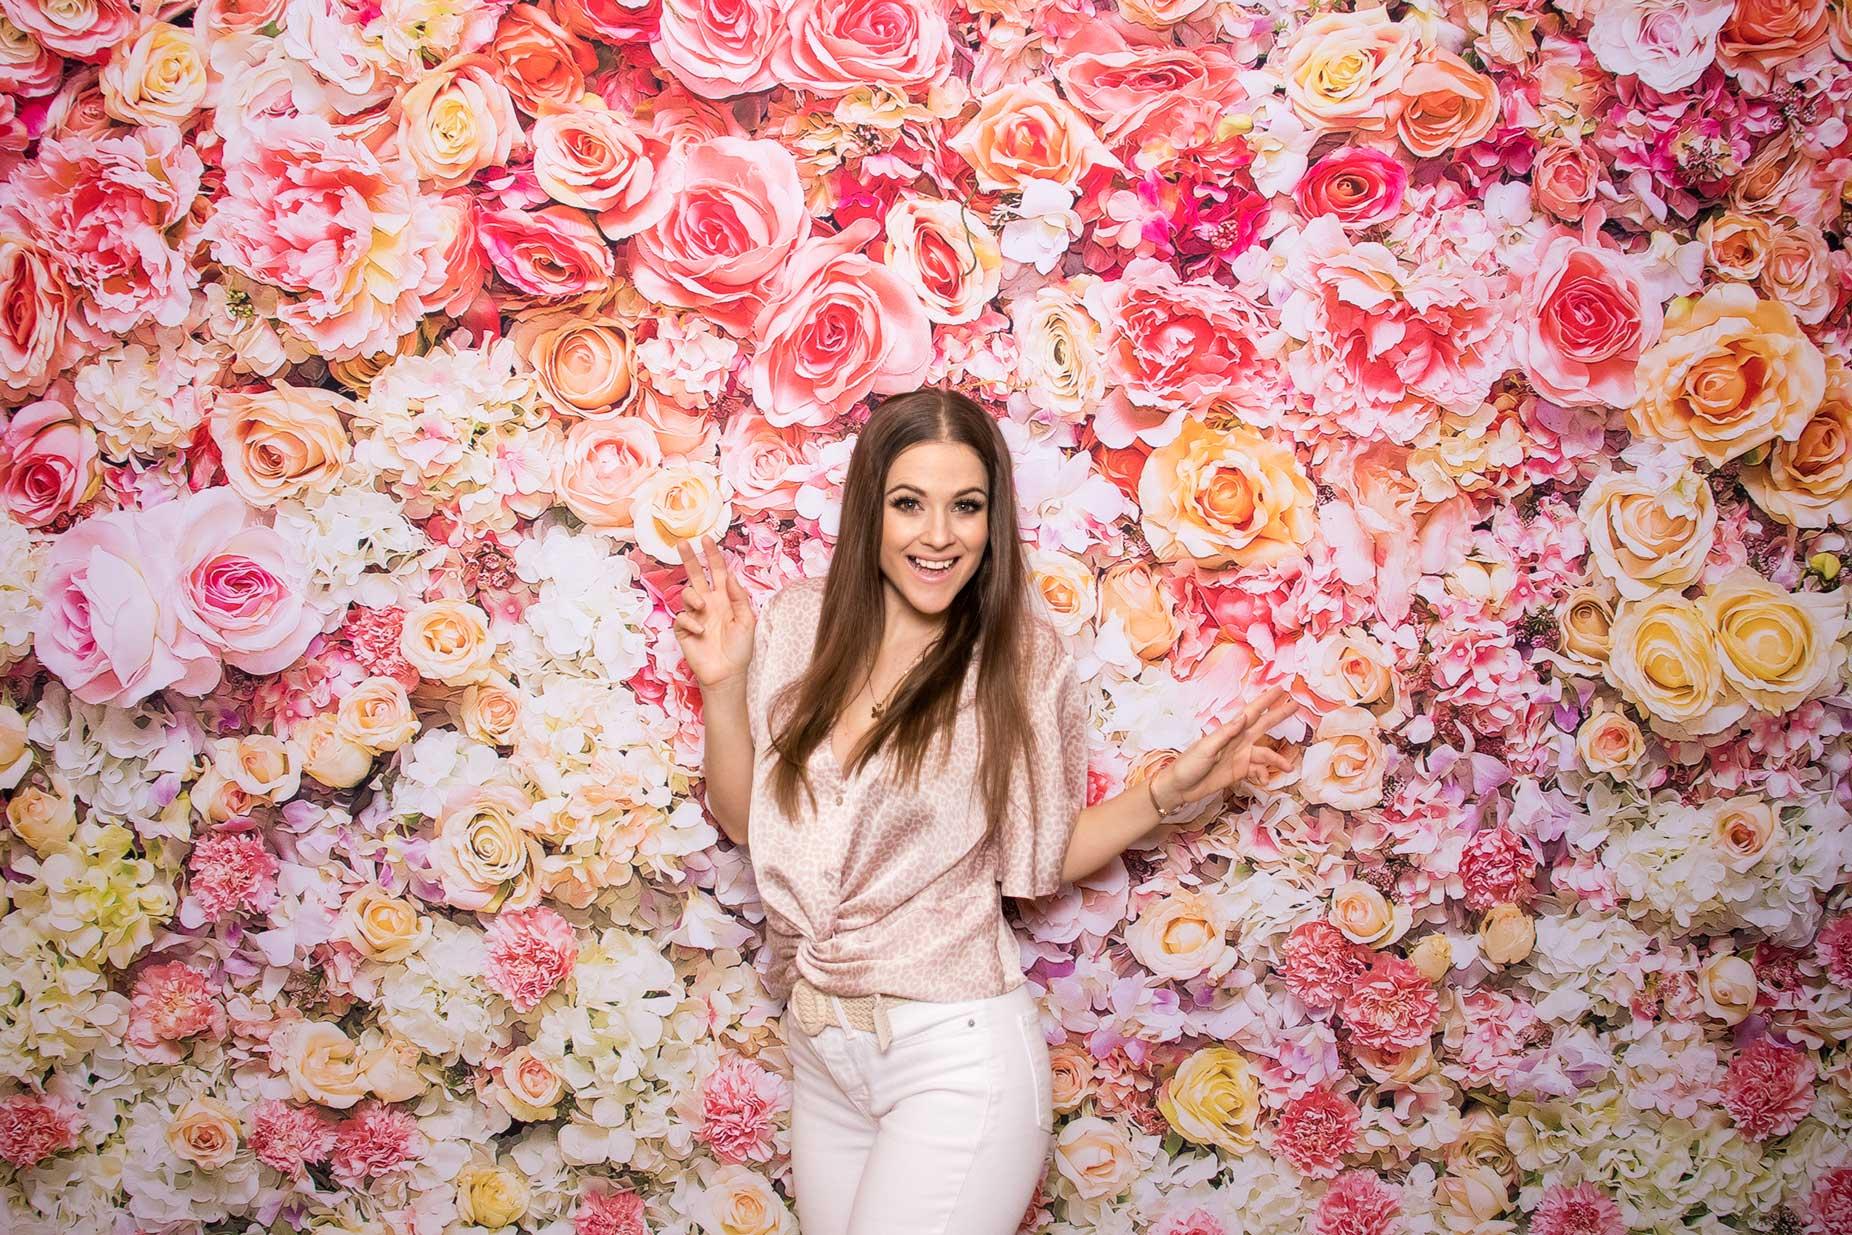 Fotostena Flower wall - svadba - fotokútik.